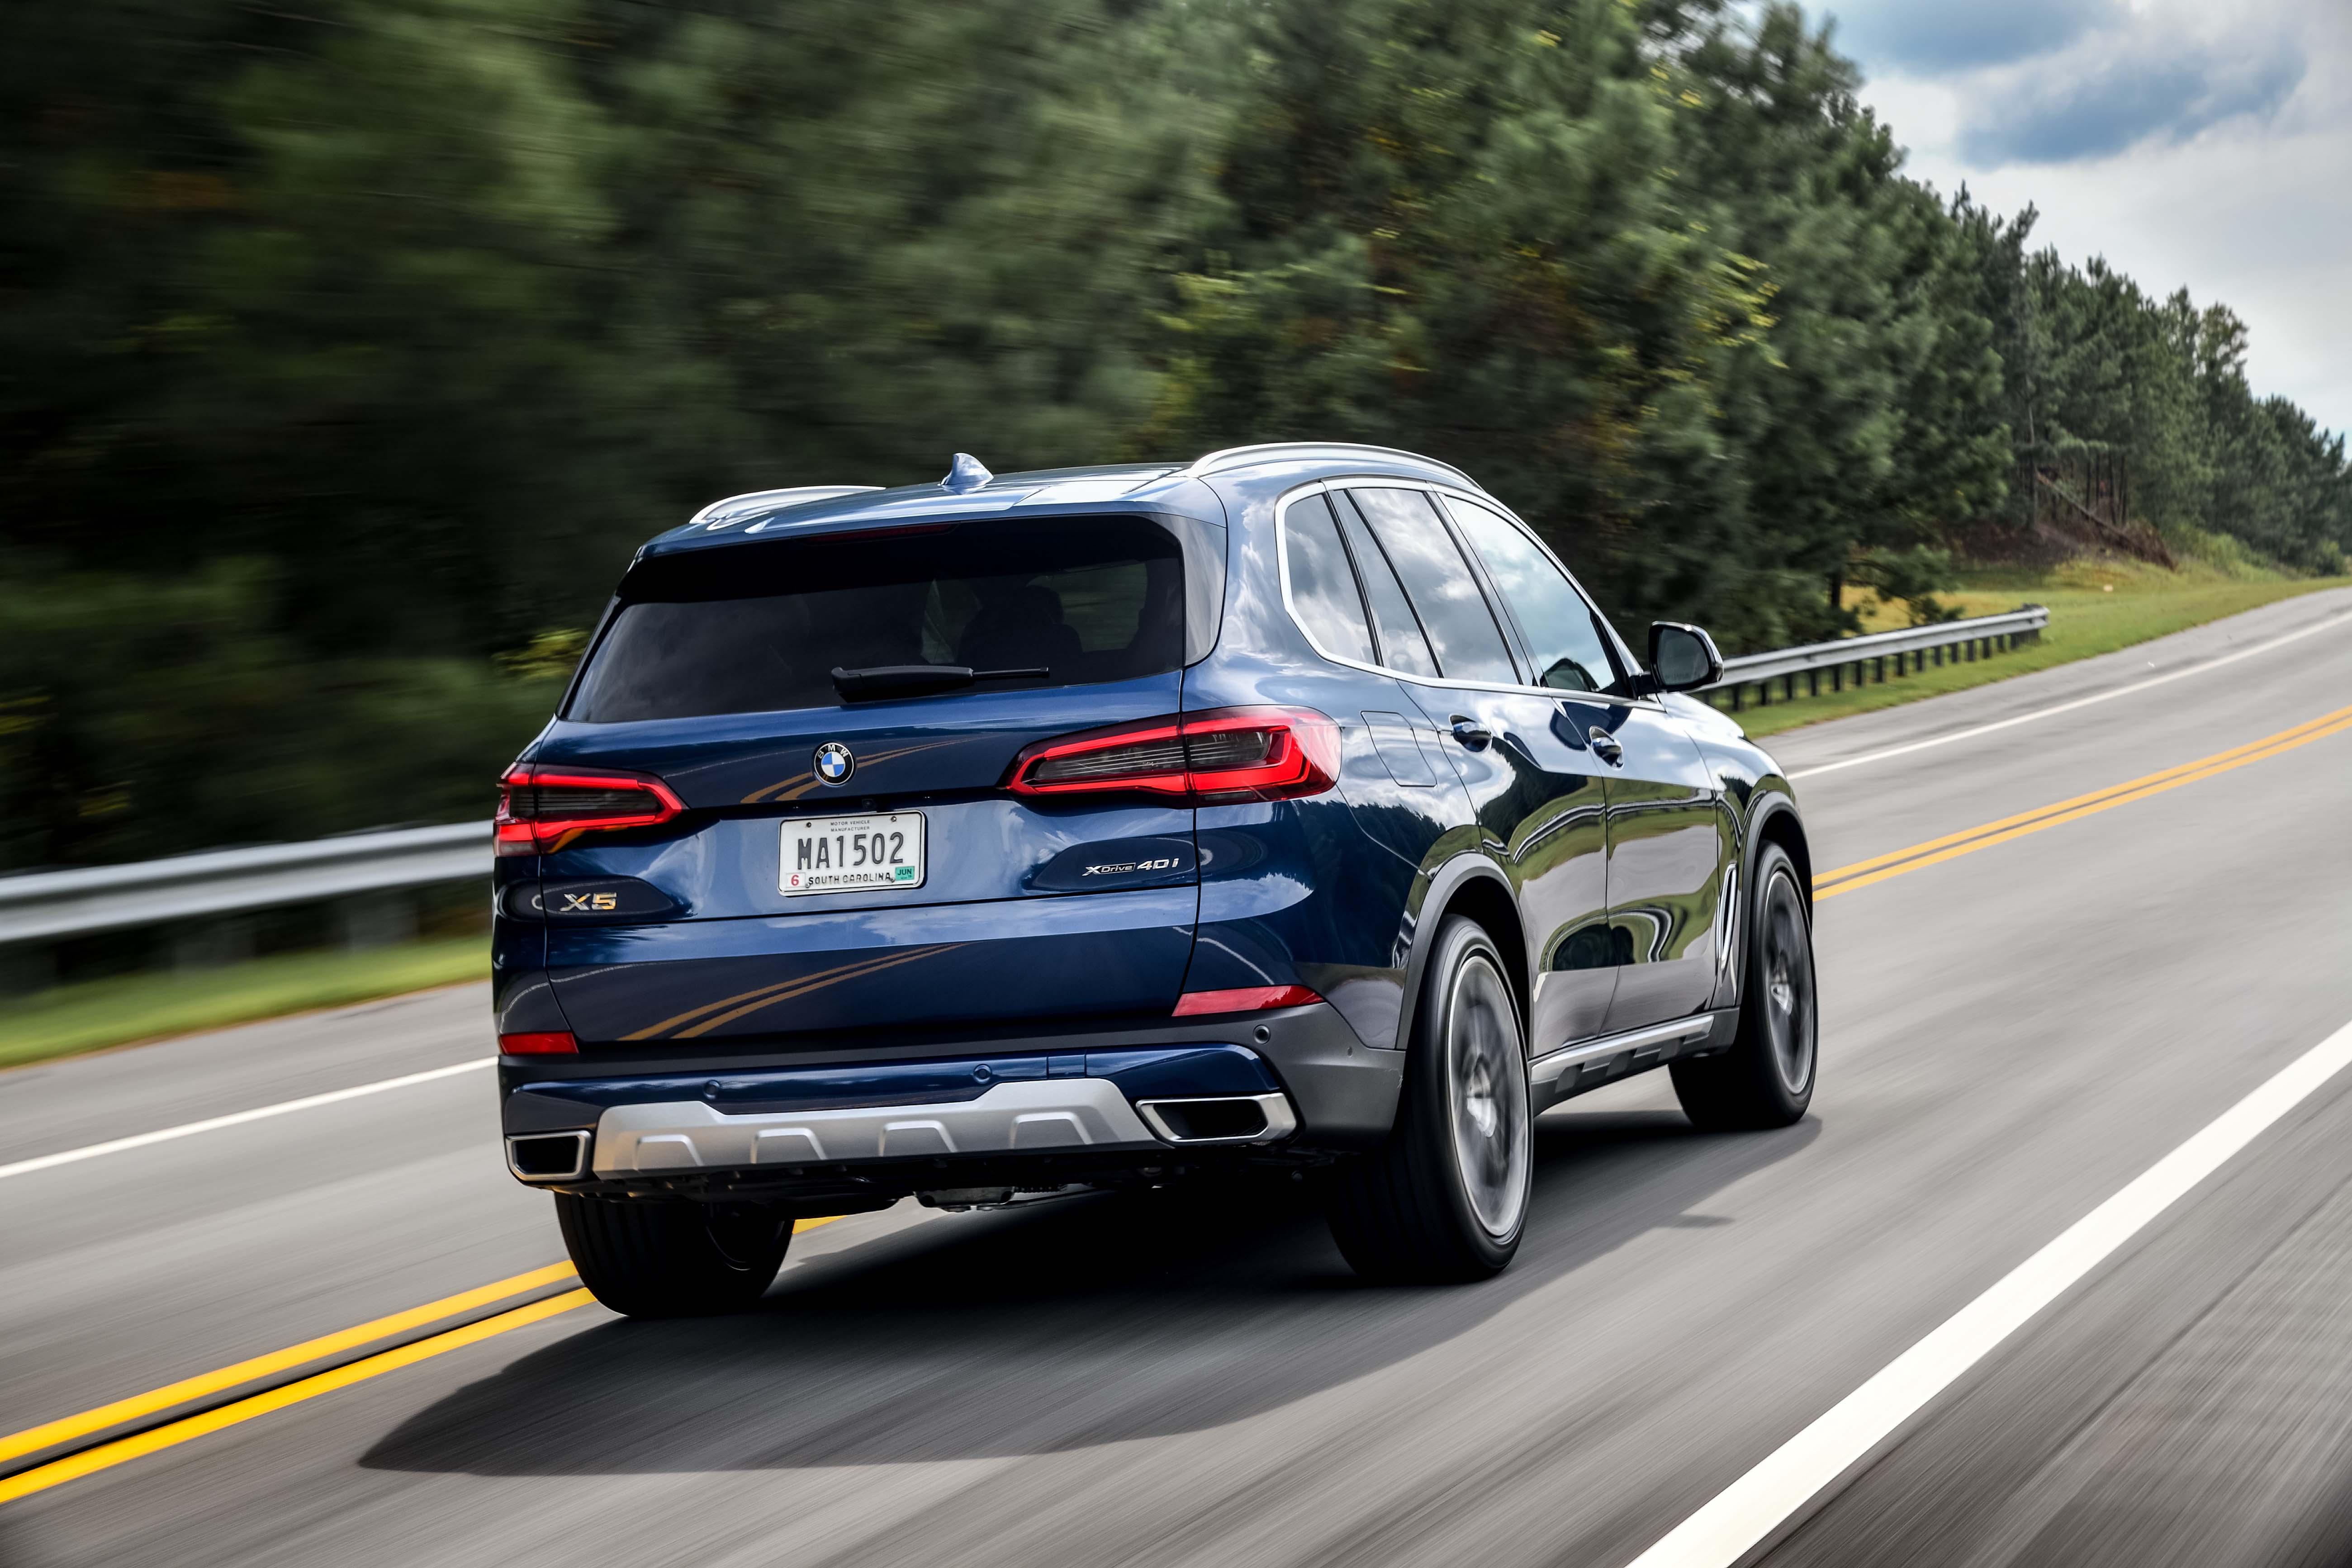 2019 BMW X5 Sports Activity Vehicle: Balanced Sovereignty